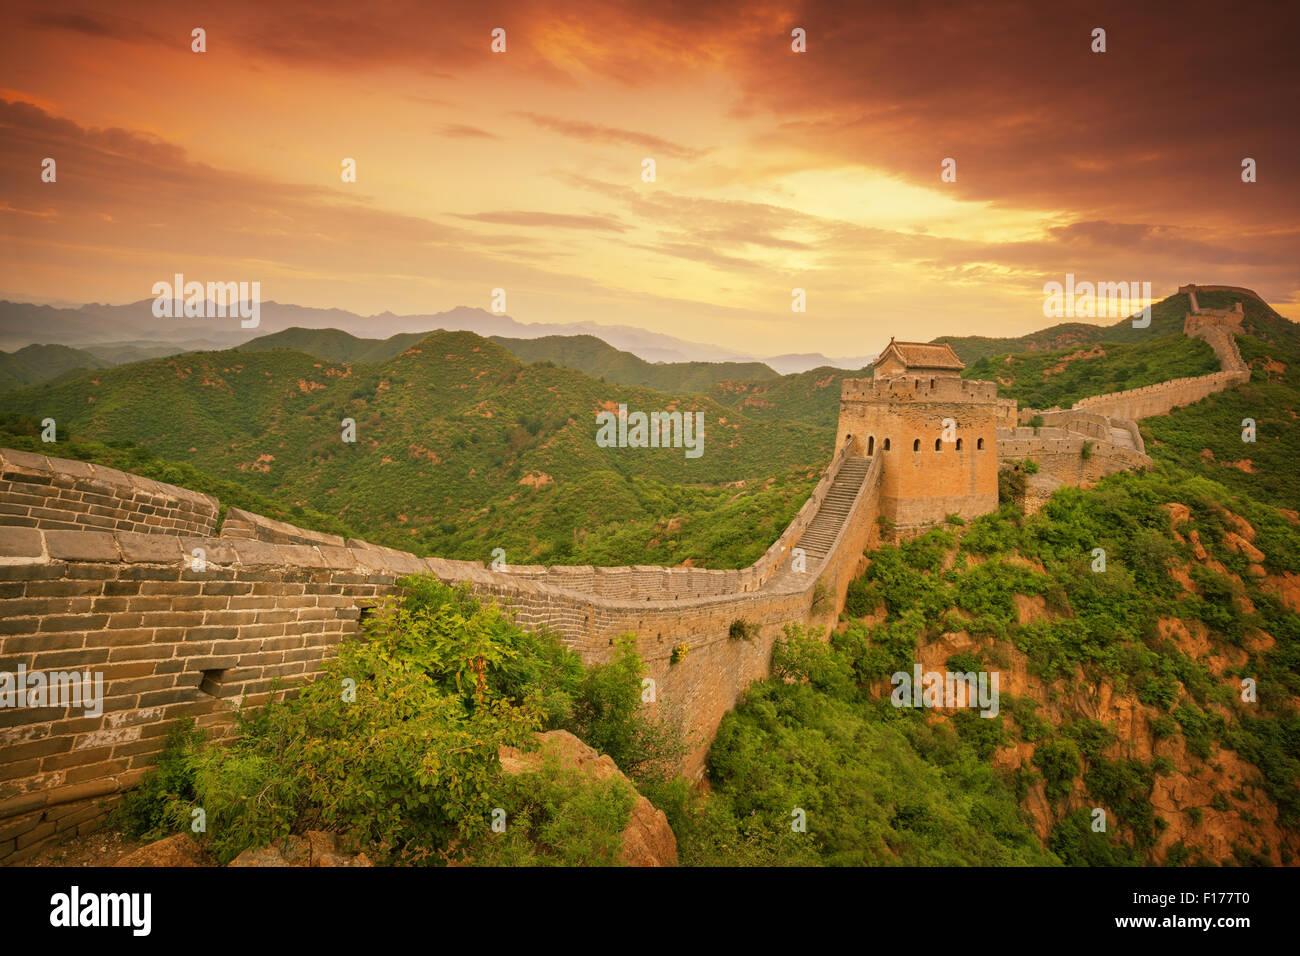 La Gran Muralla de China al amanecer. Imagen De Stock